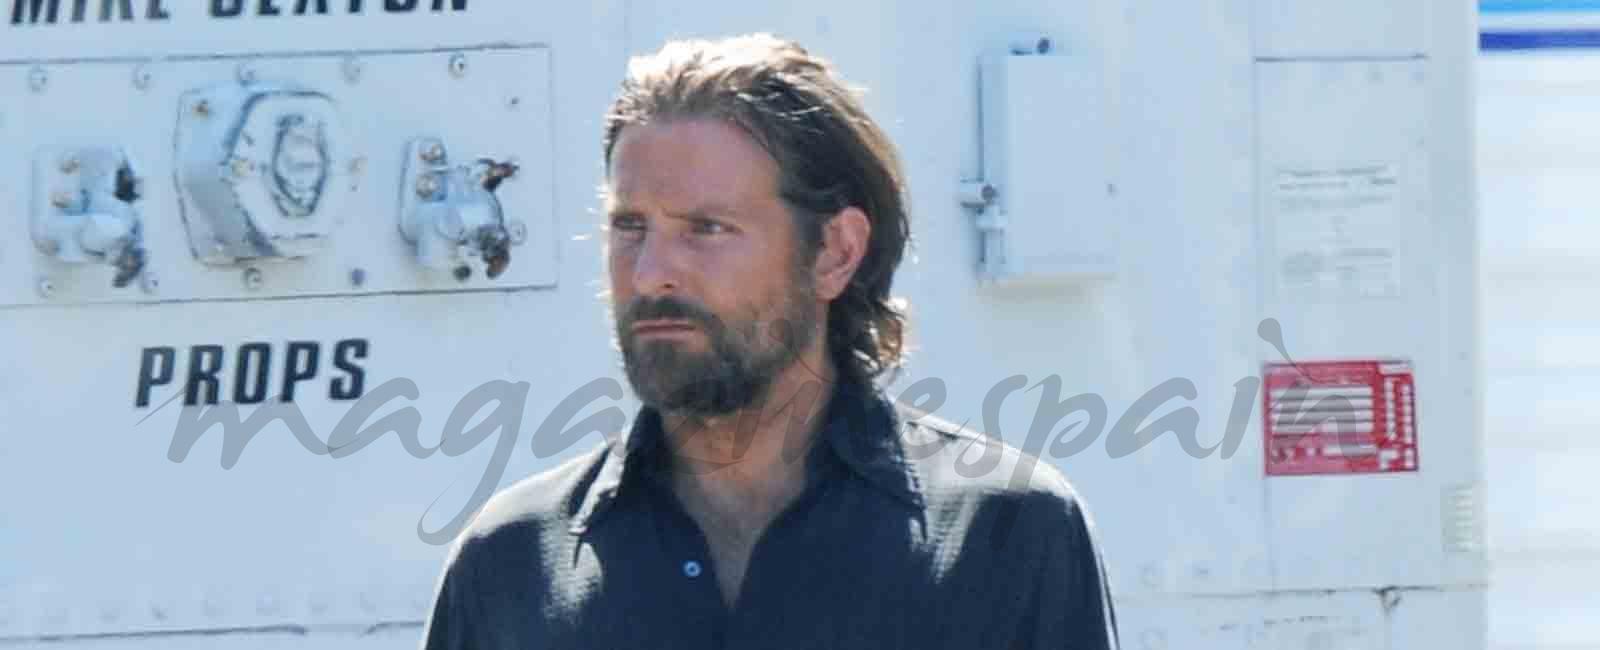 Bradley Cooper un atractivo roquero